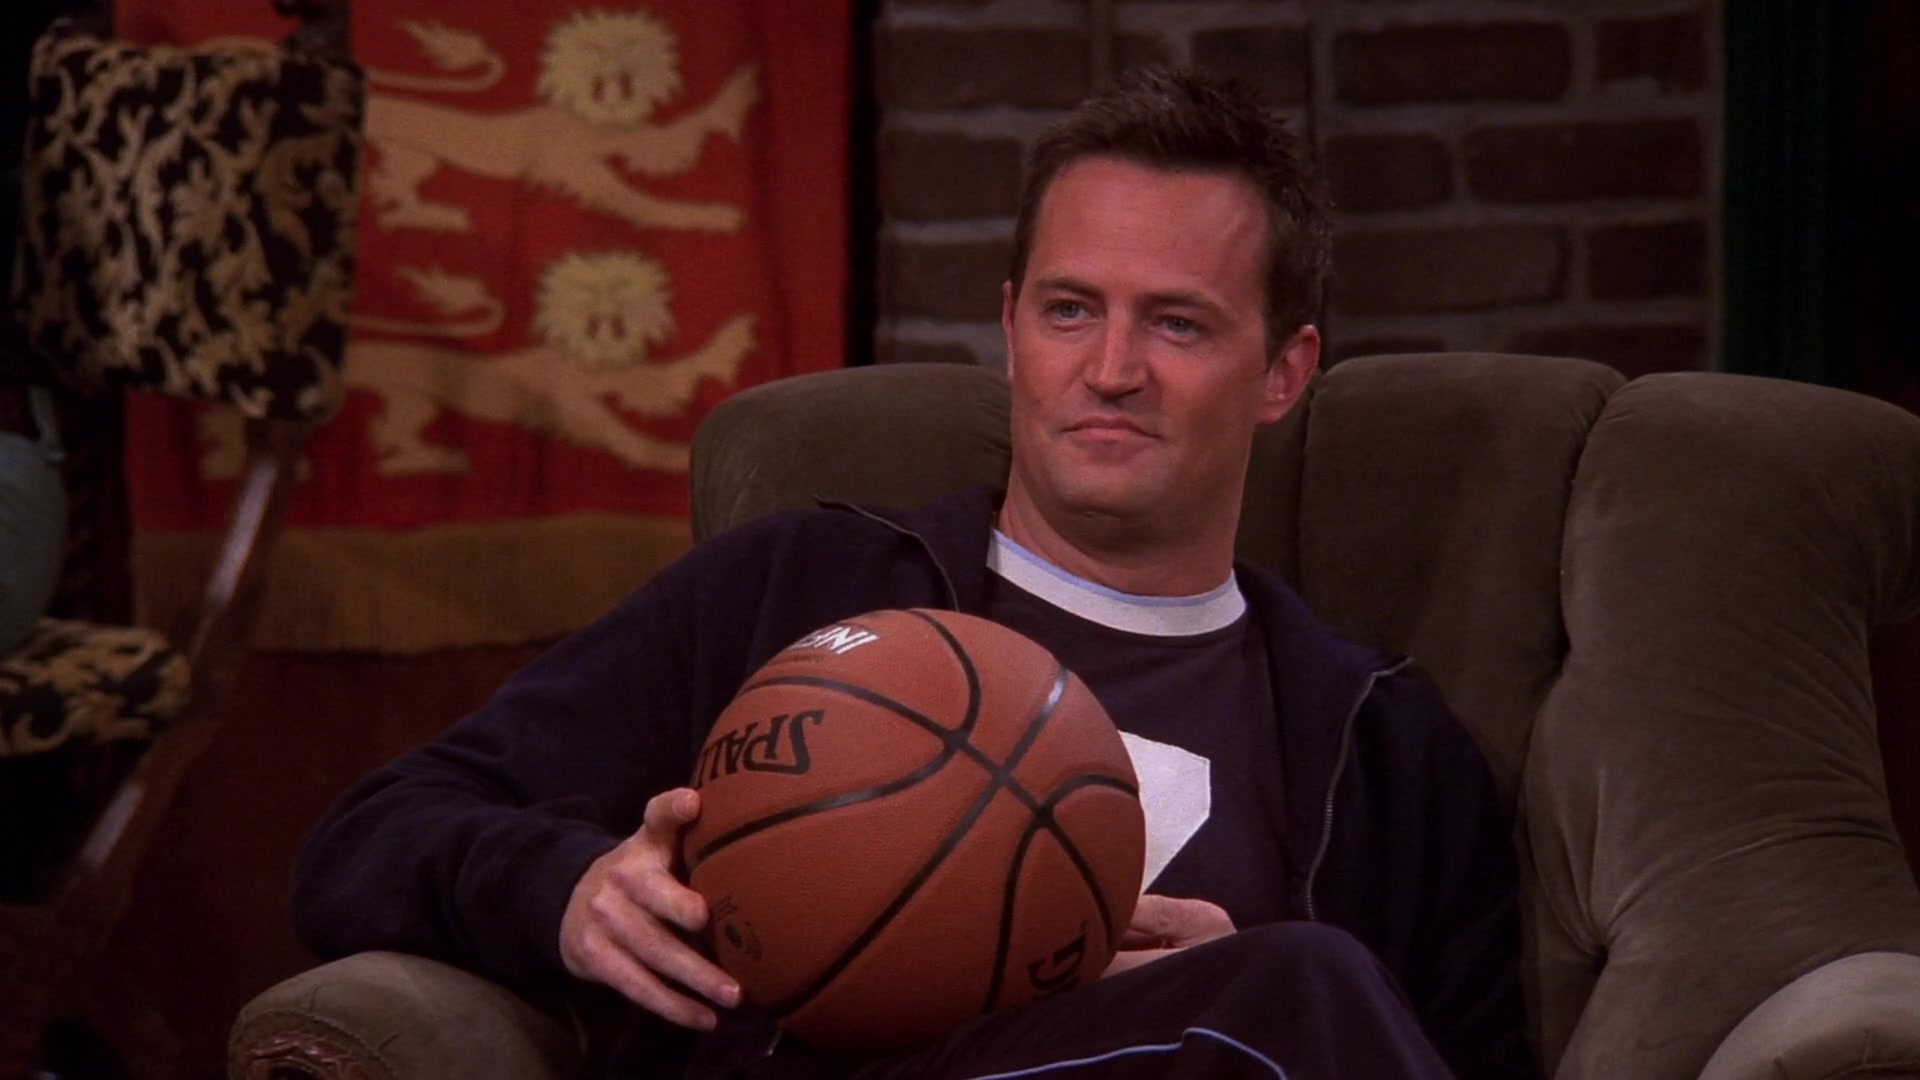 Spalding Basketball Held by Matthew Perry (Chandler Bing) in Friends